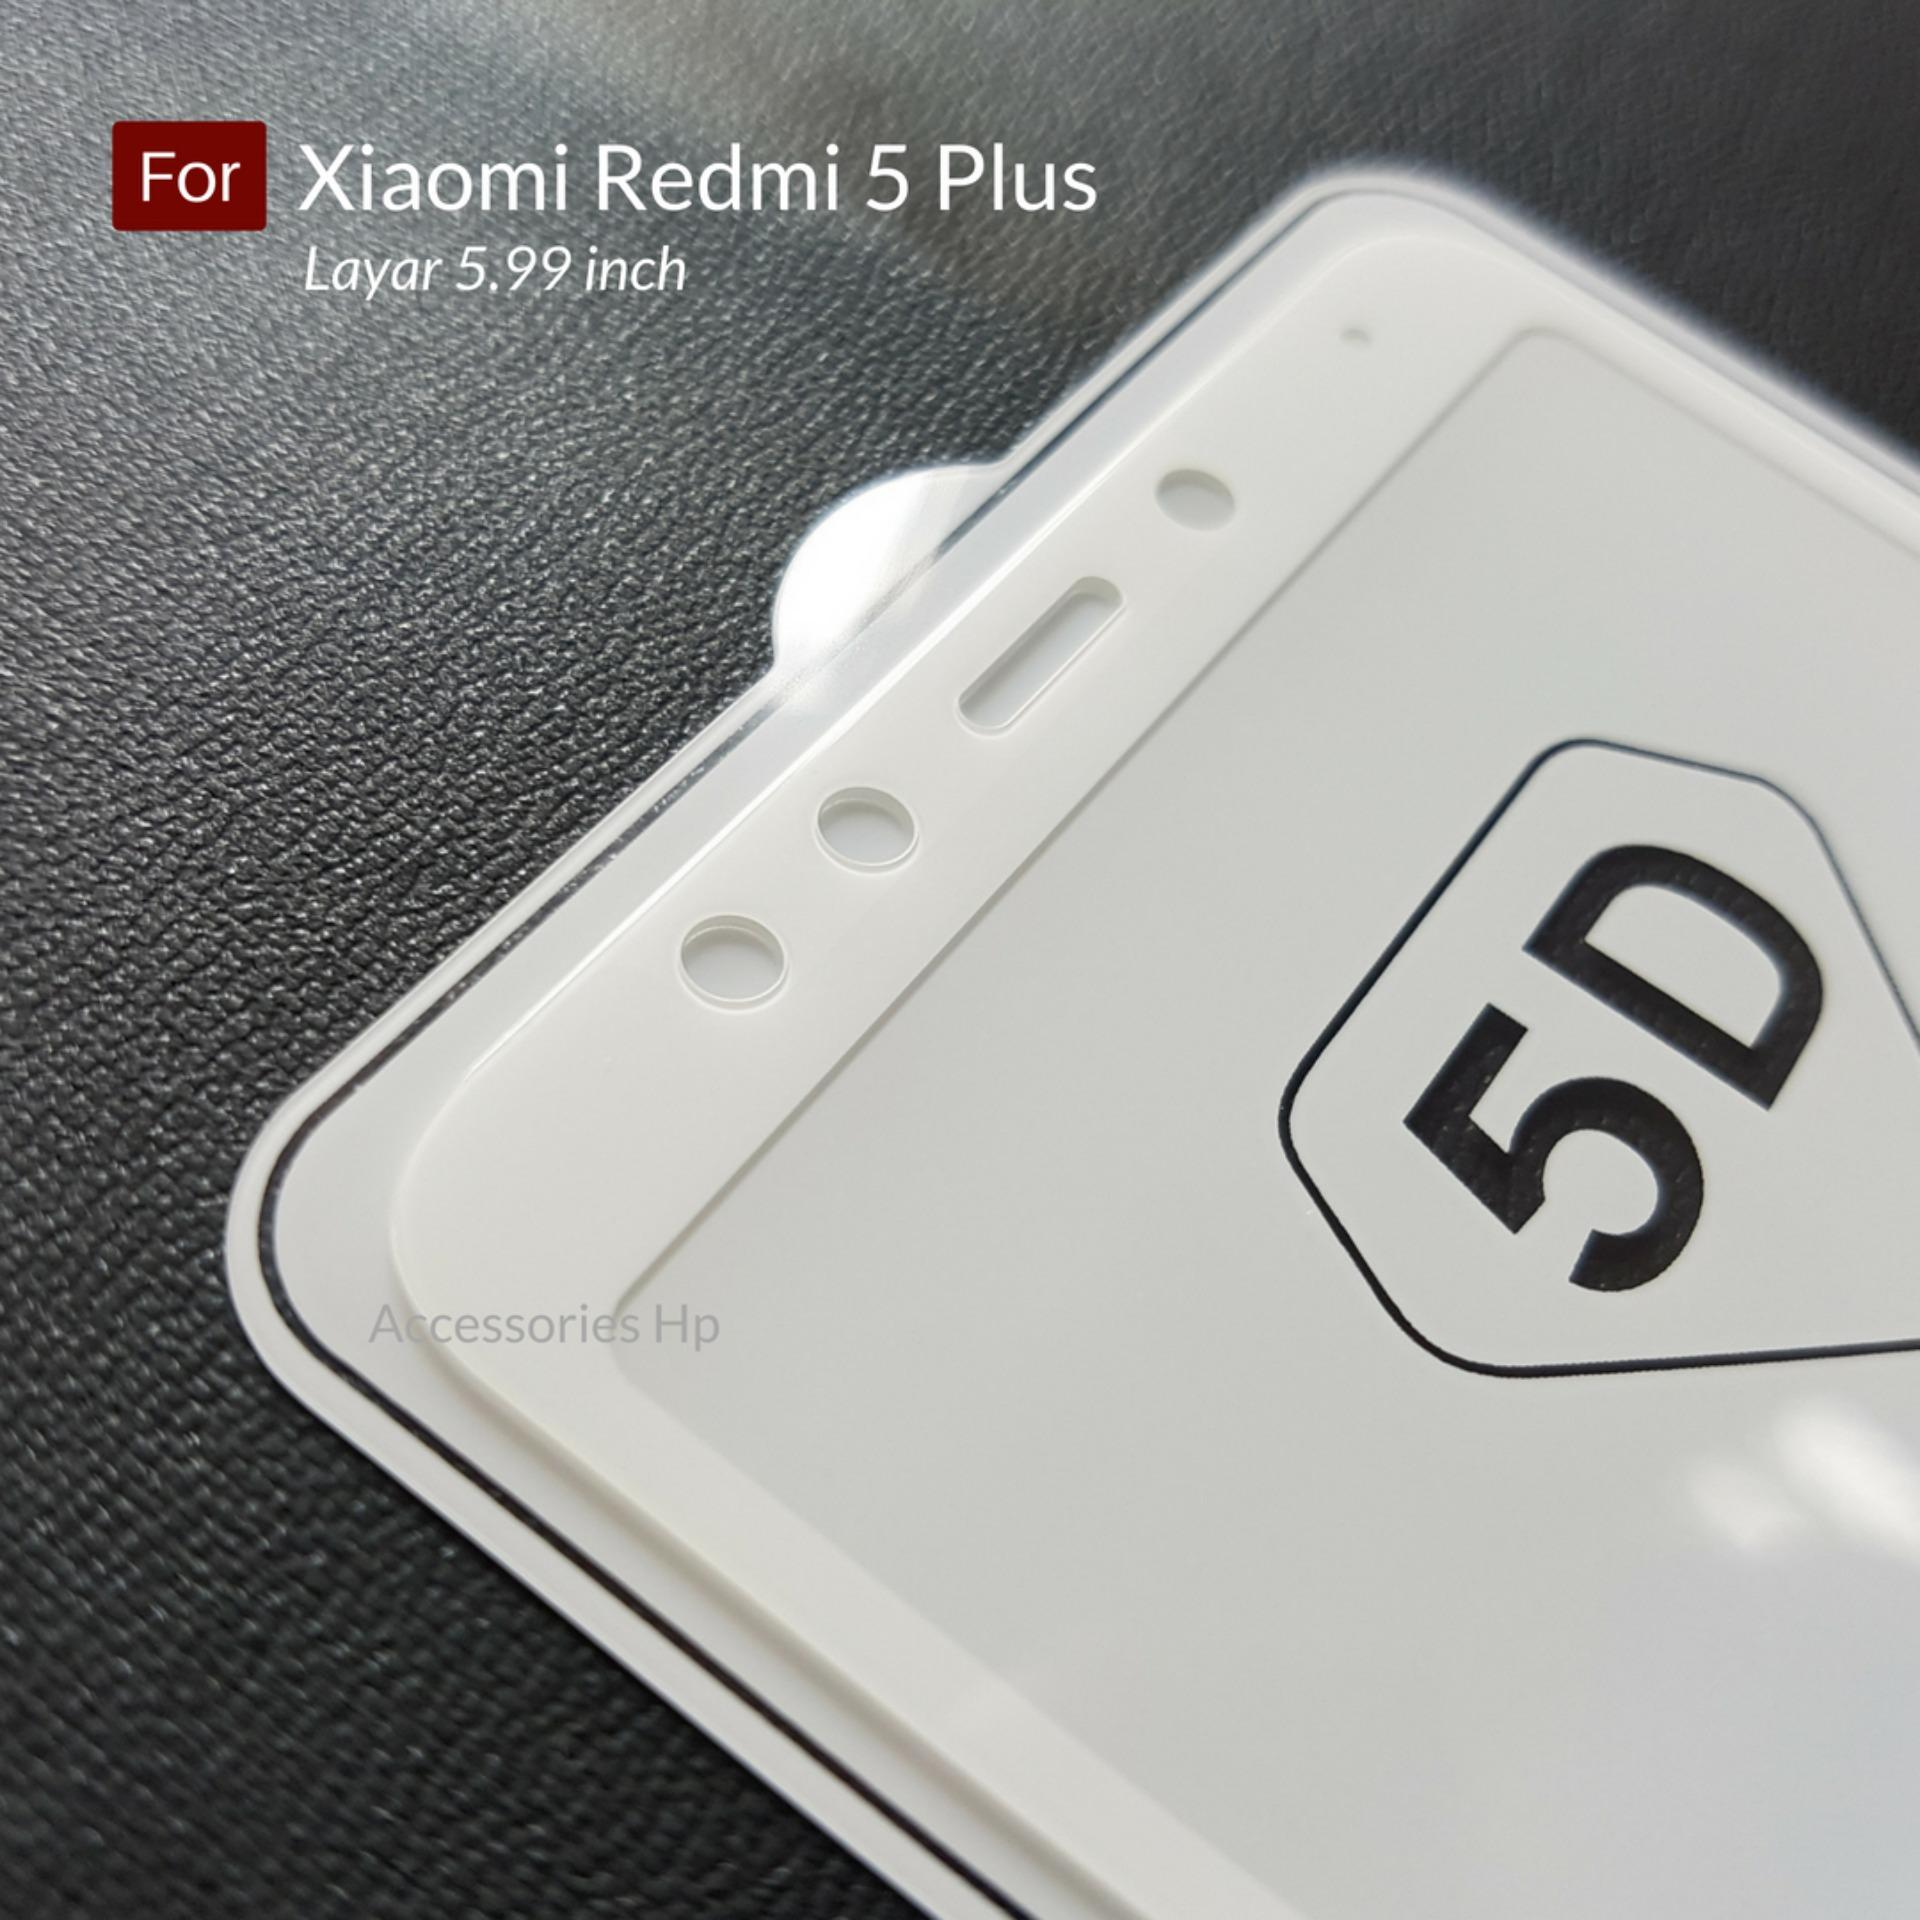 Ambigo Premium Tempered Glass 5D Full Cover Anti Gores Warna Kaca Full Lem For Xiaomi Redmi